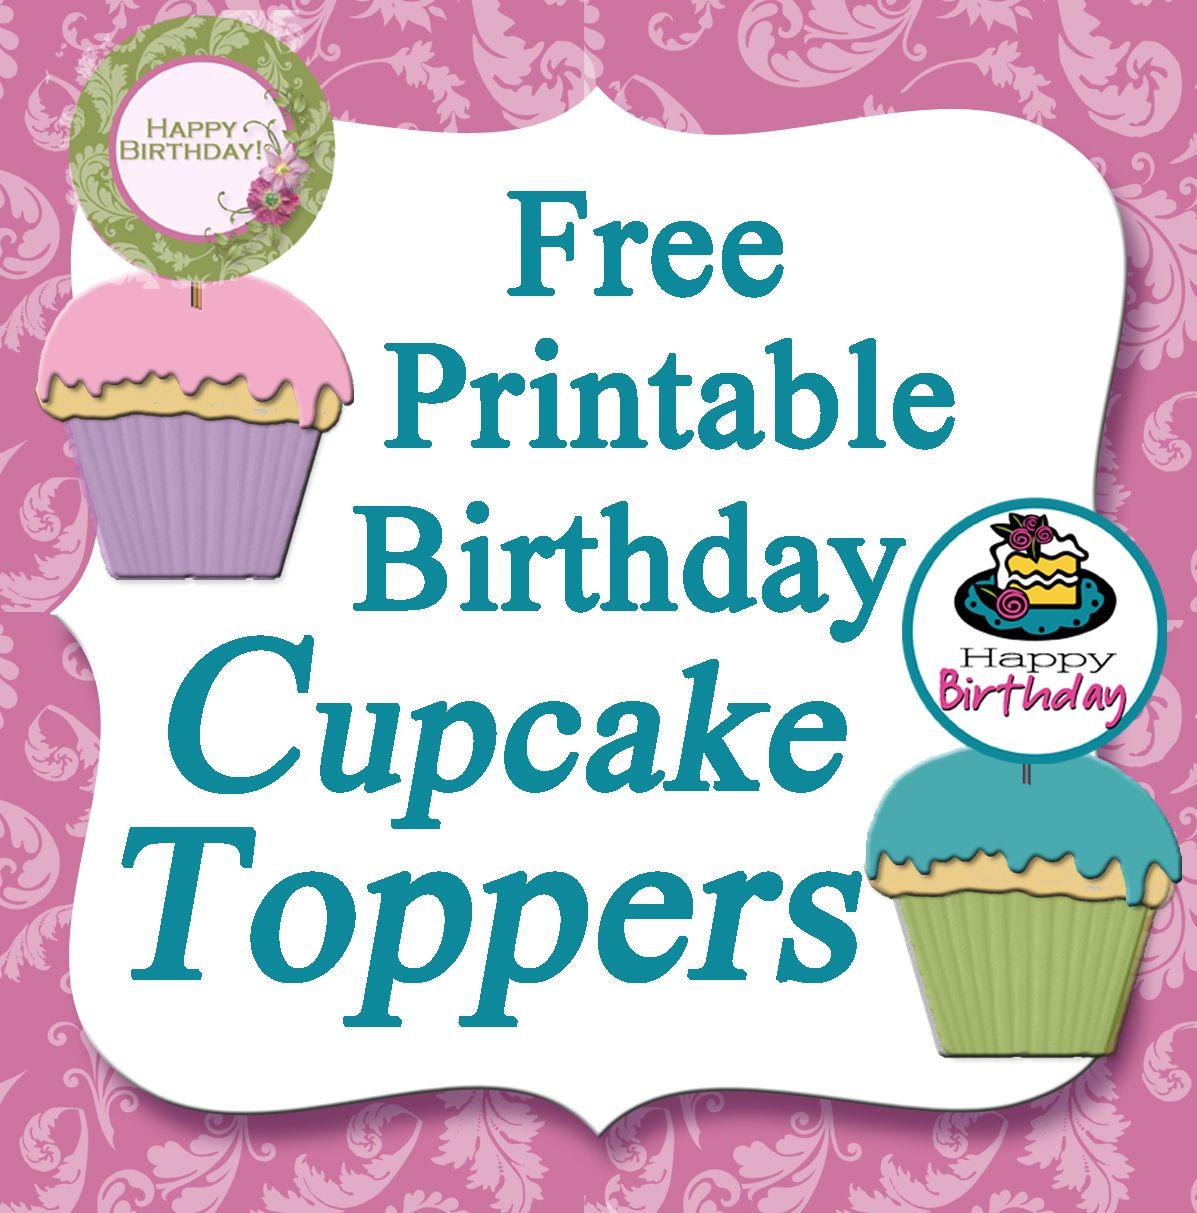 Free printable birthday cupcake toppers birthday